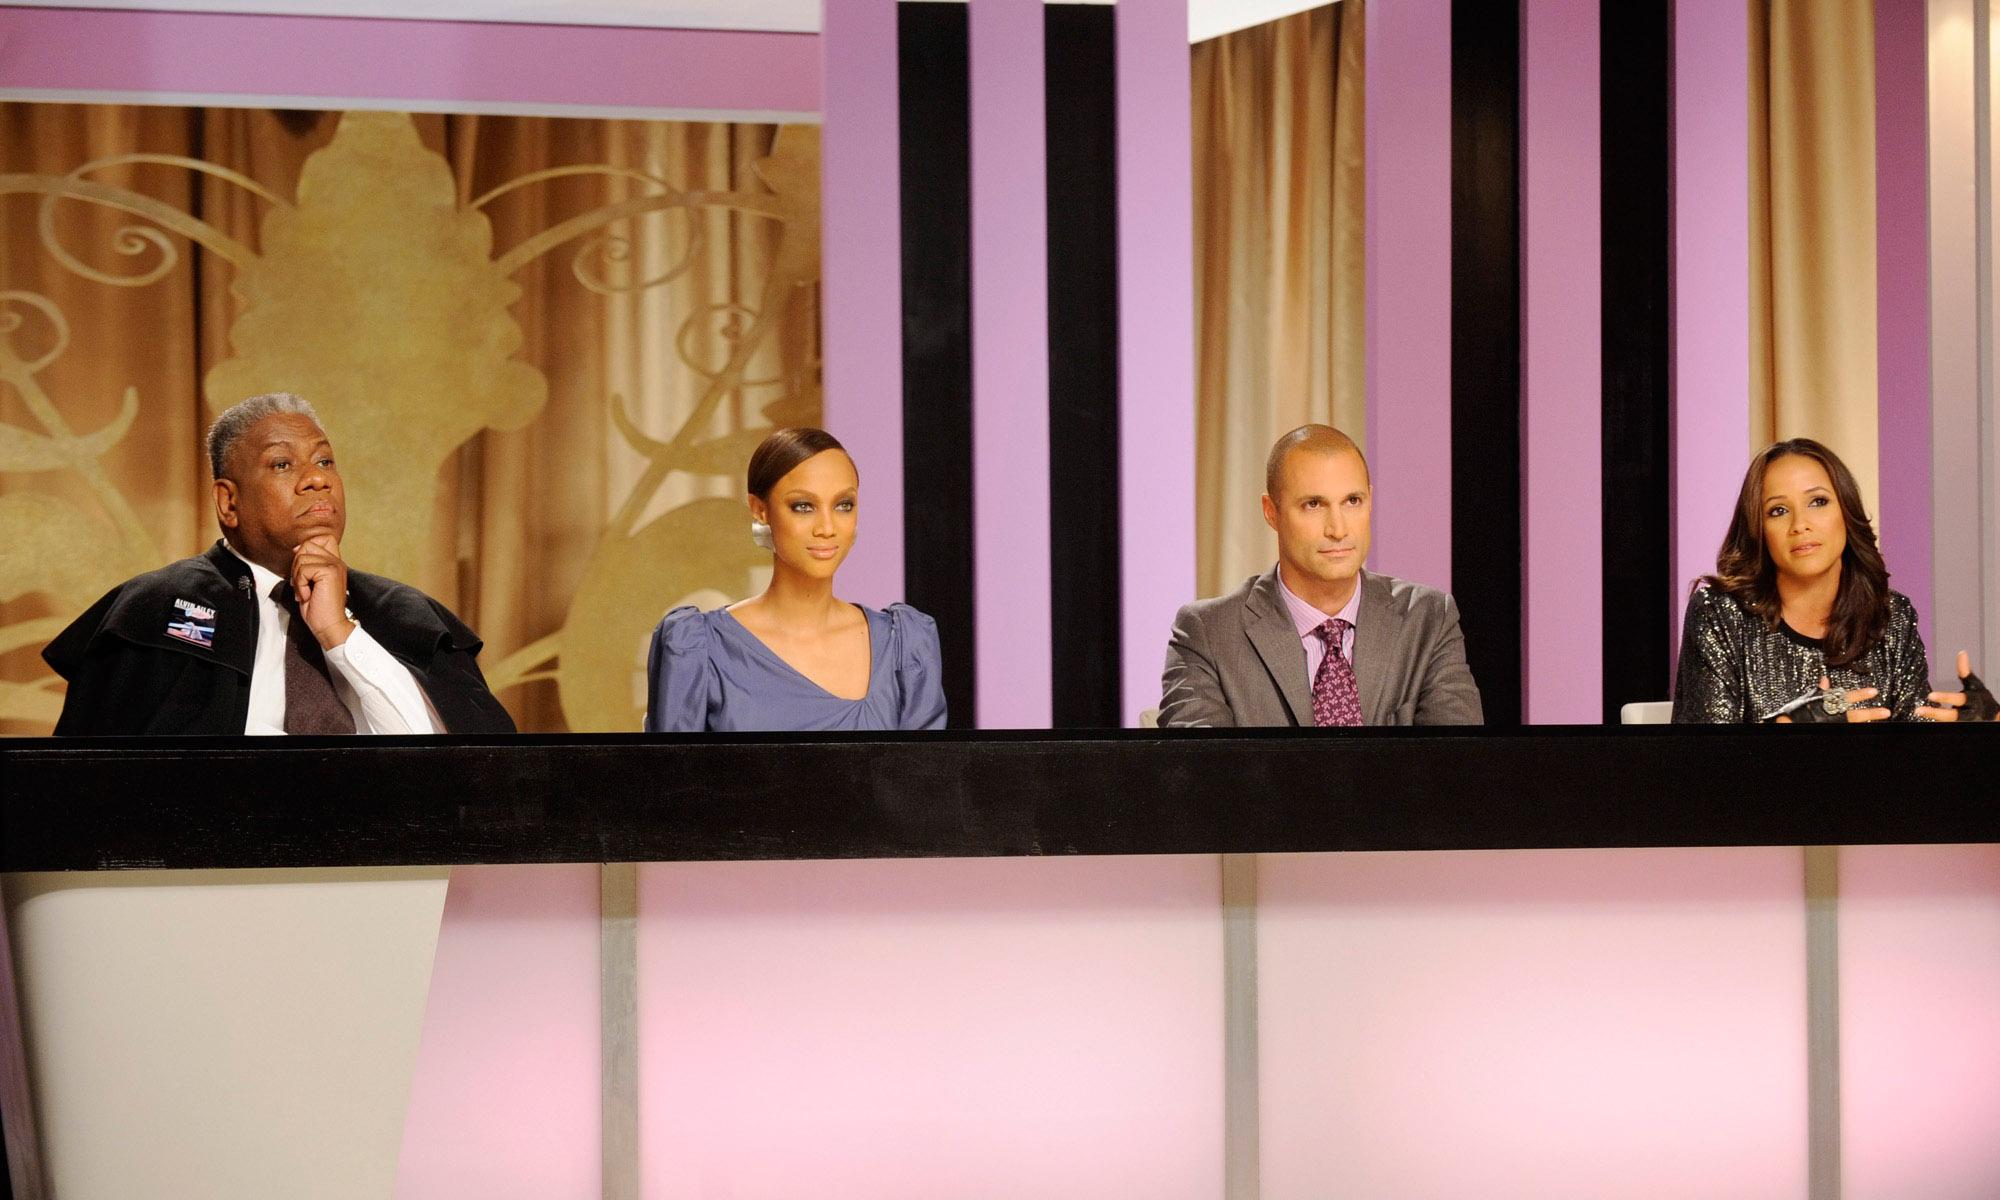 AMERICA'S NEXT TOP MODEL, (from left): judge Andre Leon Talley, host Tyra Banks, judge Nigel Barker,